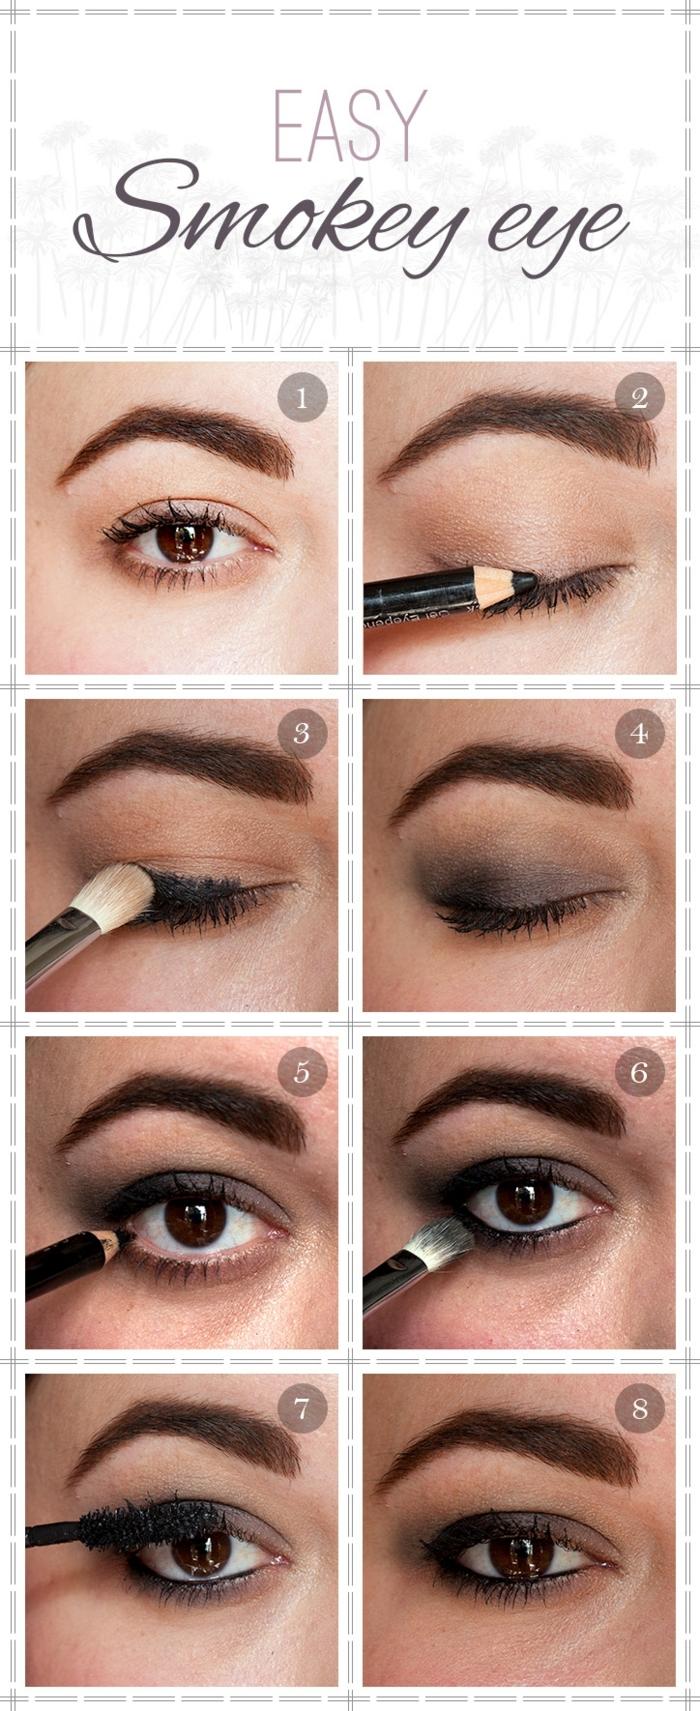 tuto maquillage yeux marrons, crayon noir, mascara noir, pinceau smudge, maquillage smoky